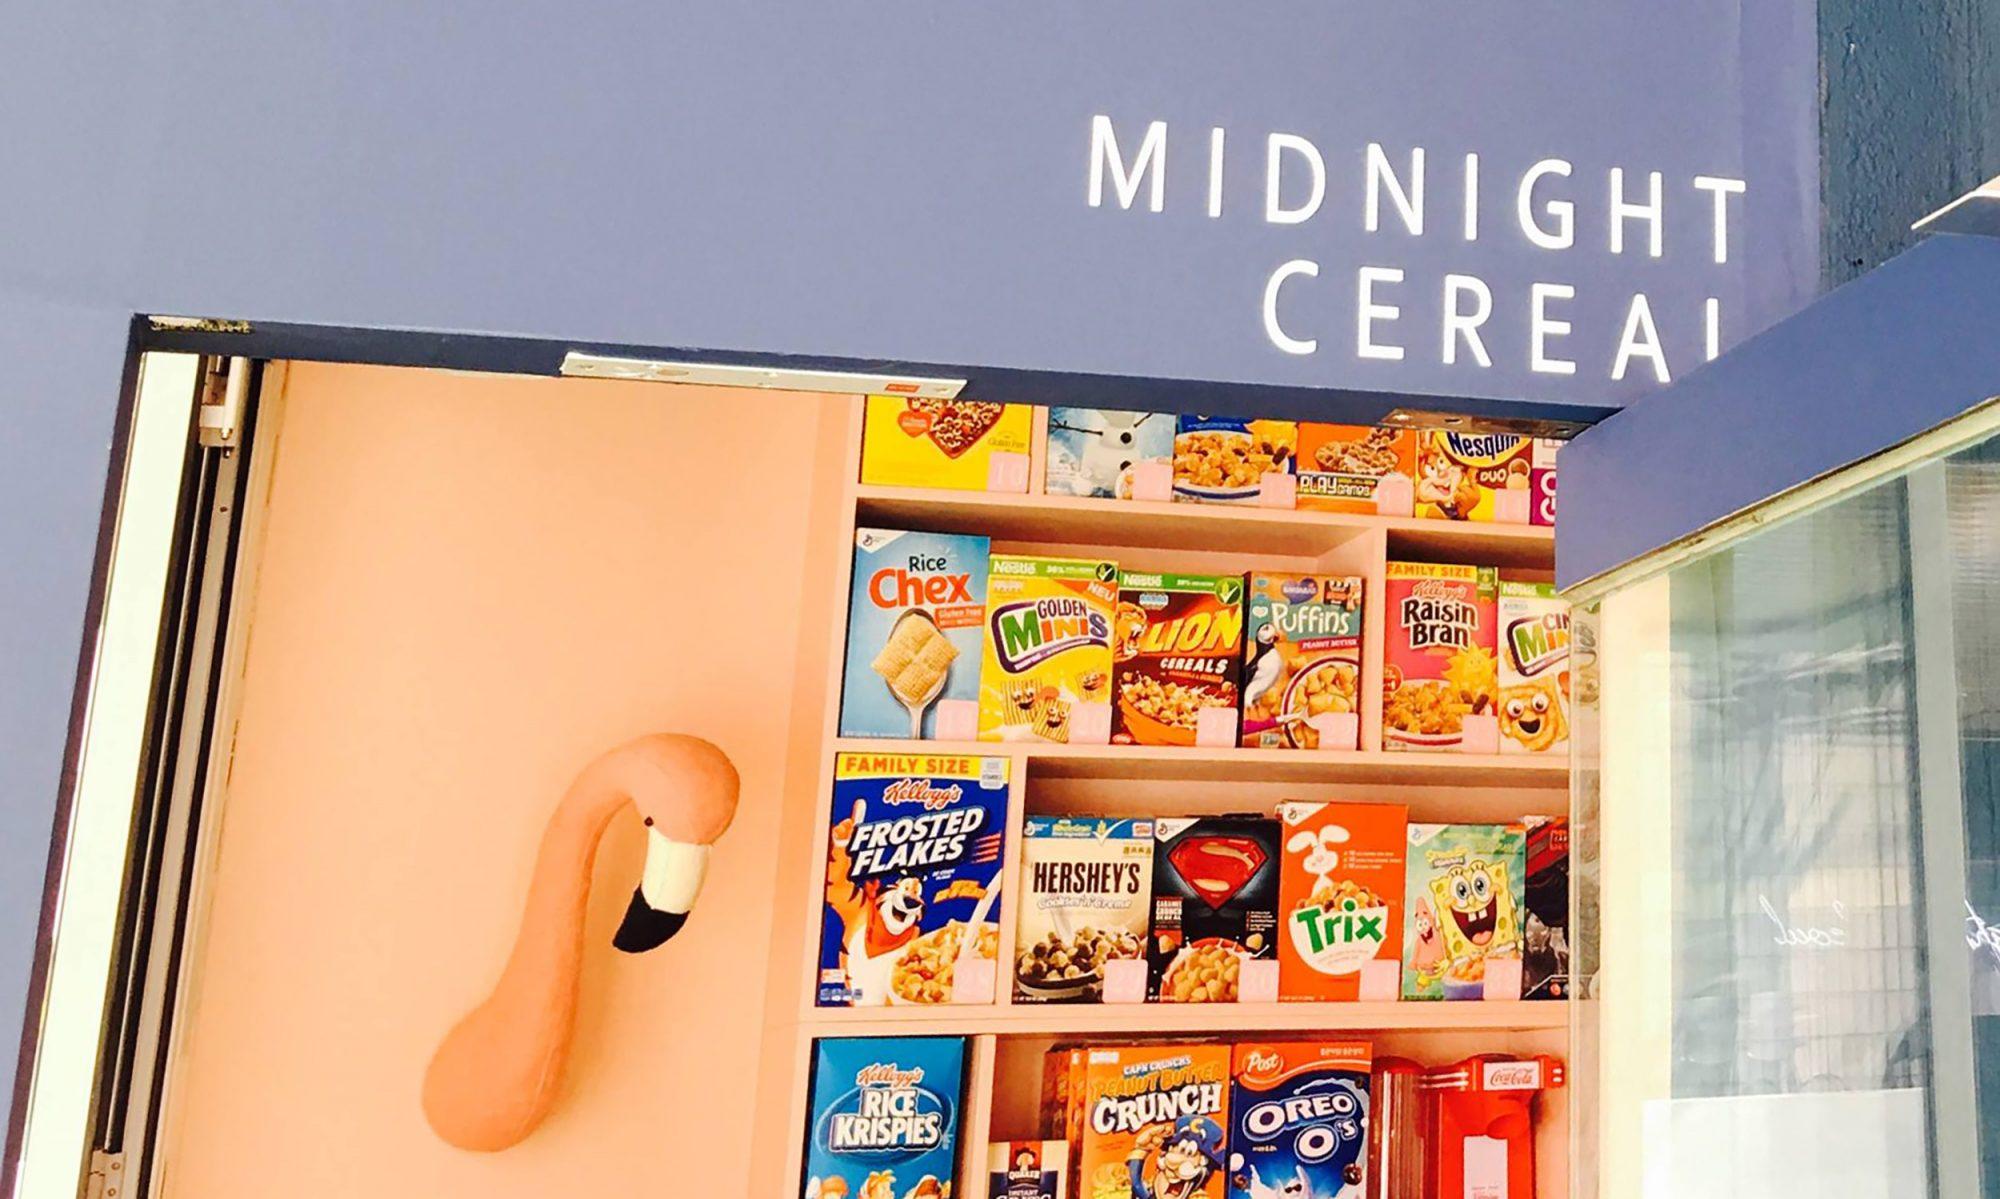 EC: Cereal Cafes Are South Korea's Newest Food Craze